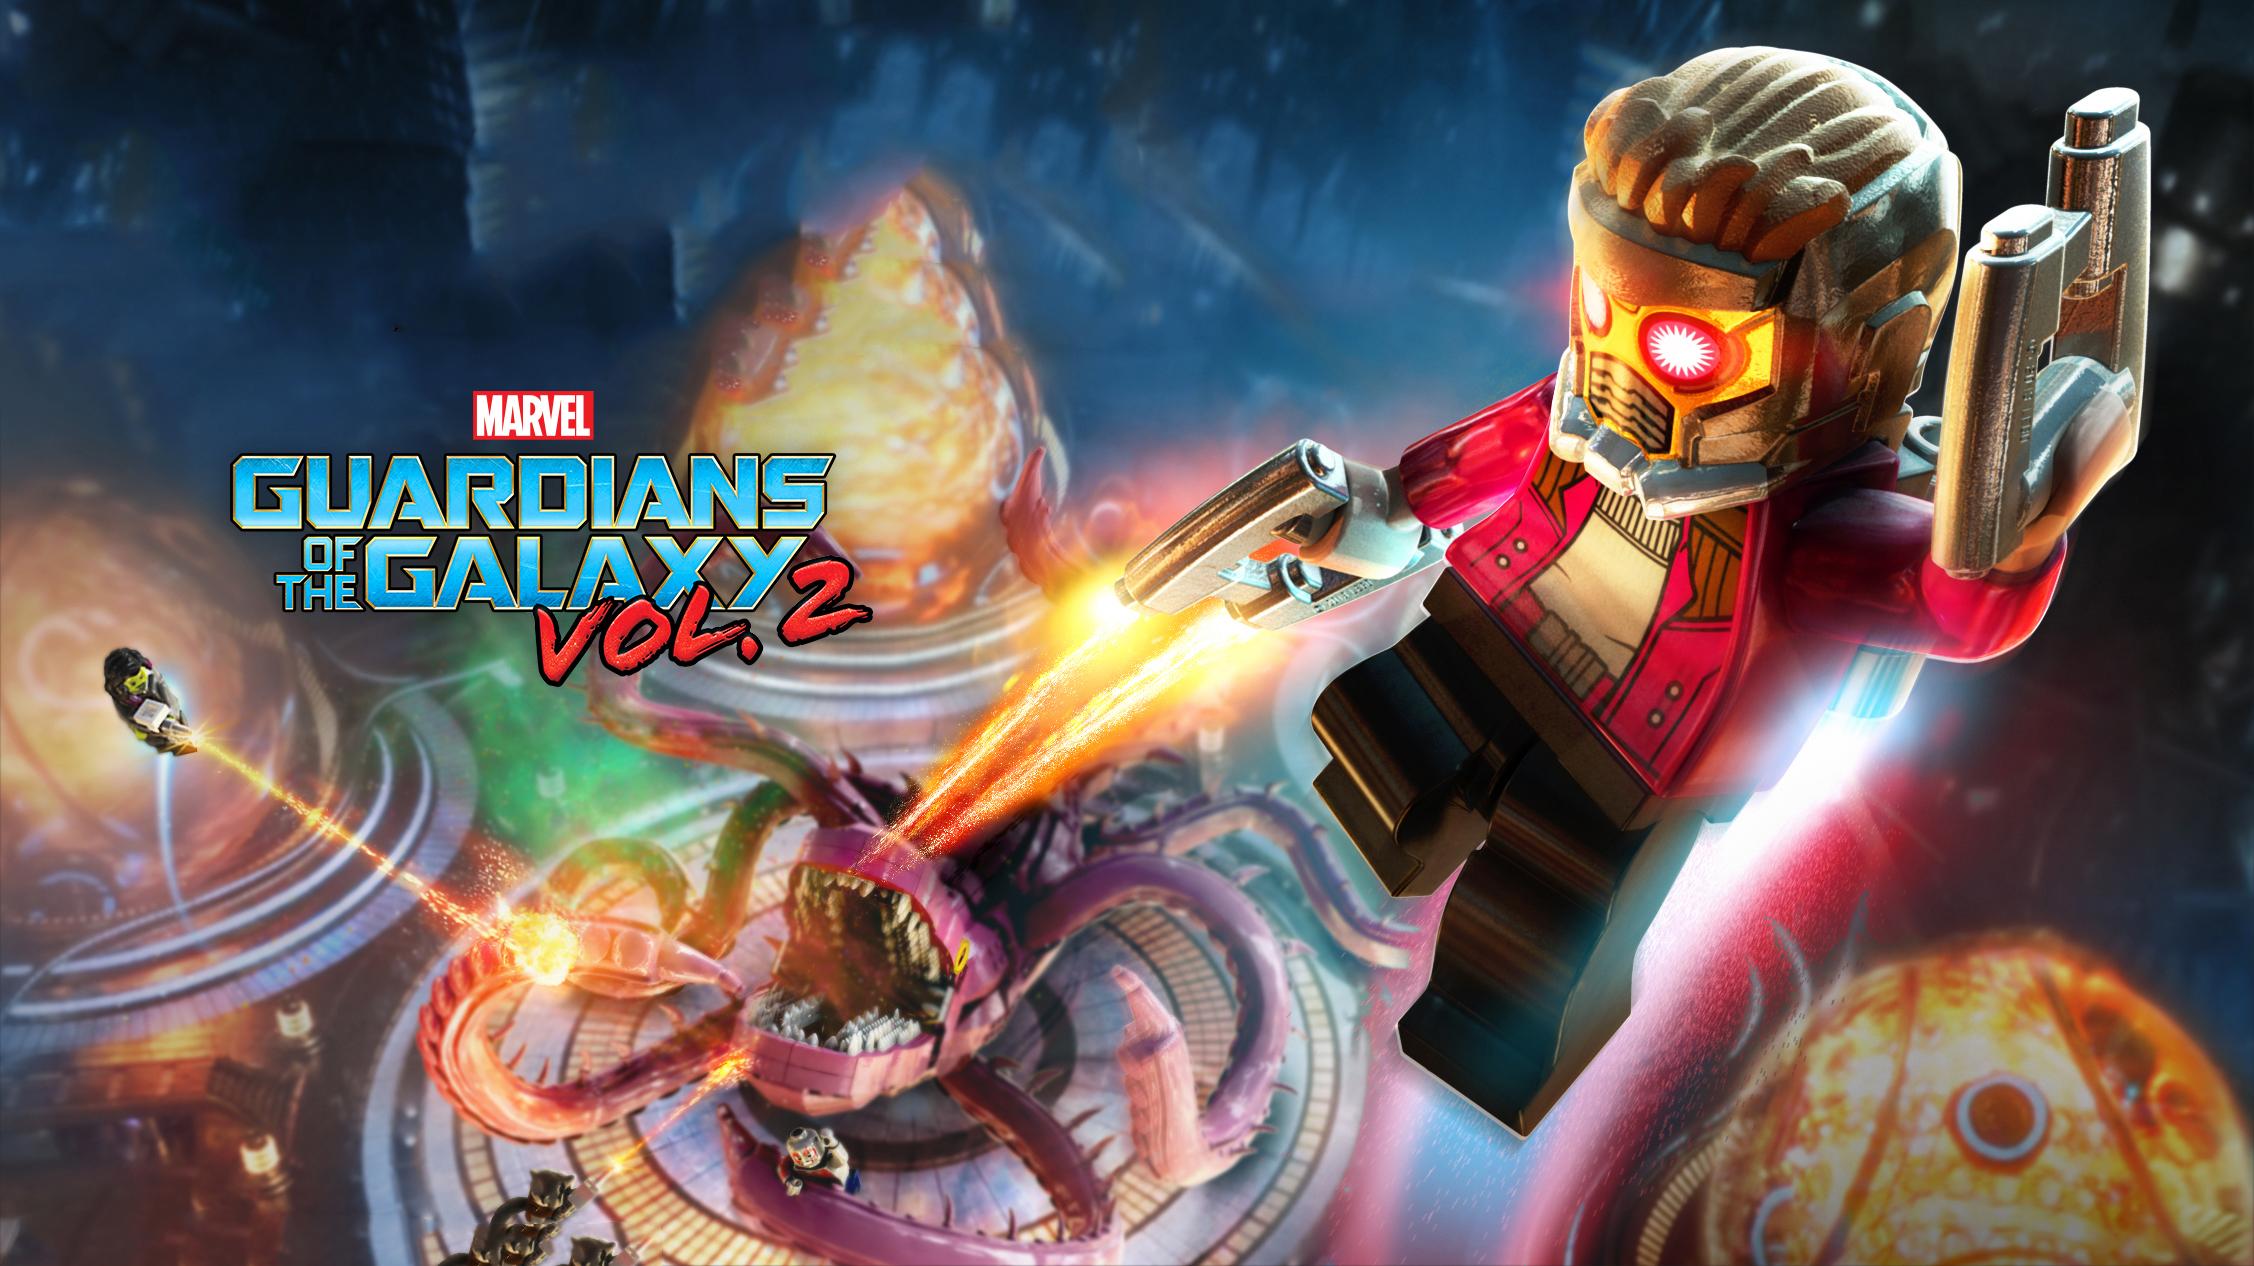 Guardians Of The Galaxy Vol 2 Wallpaper: Guardians Of The Galaxy Vol 2 Lego, HD Movies, 4k